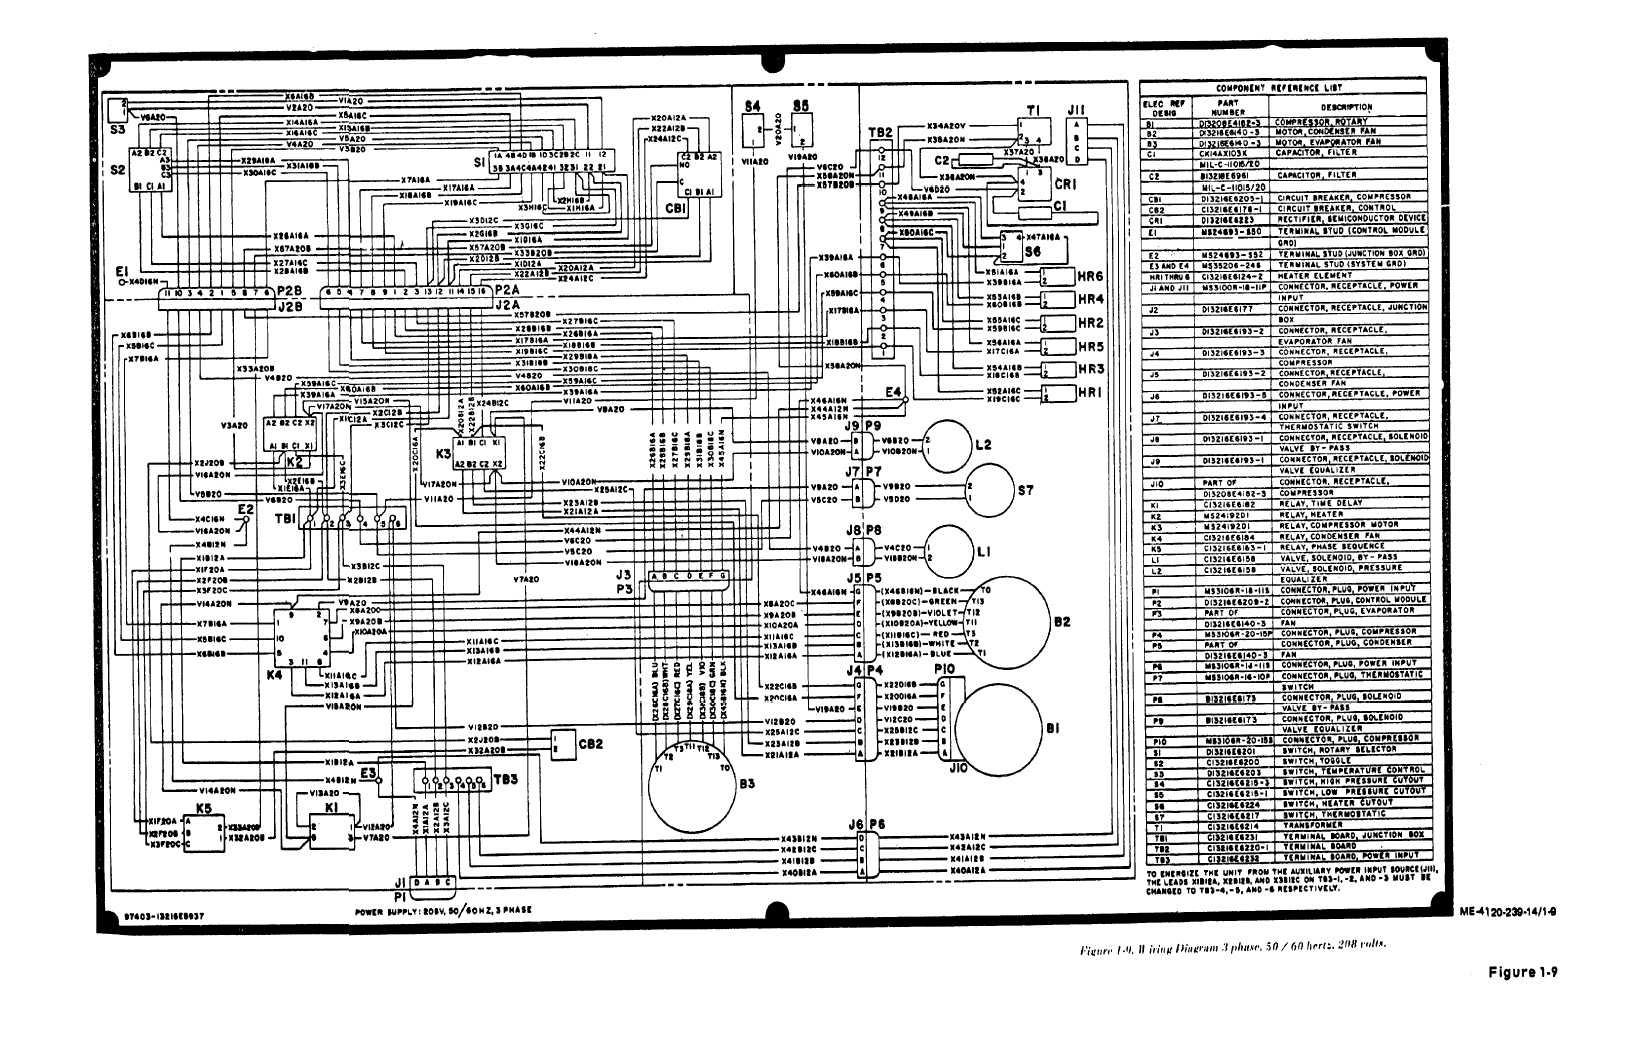 Diagram 3 Phase Motor 208 Wiring Diagram 9 Wires Full Version Hd Quality 9 Wires Diagramtanjab Tarantelluccia It